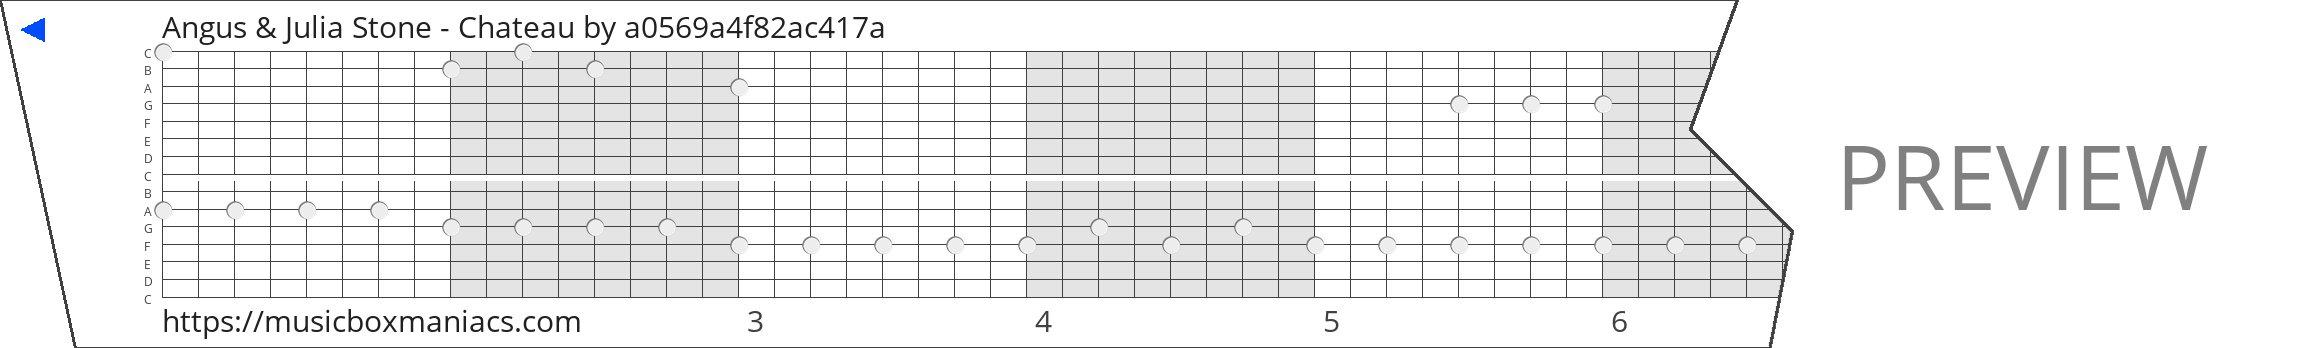 Angus & Julia Stone - Chateau 15 note music box paper strip